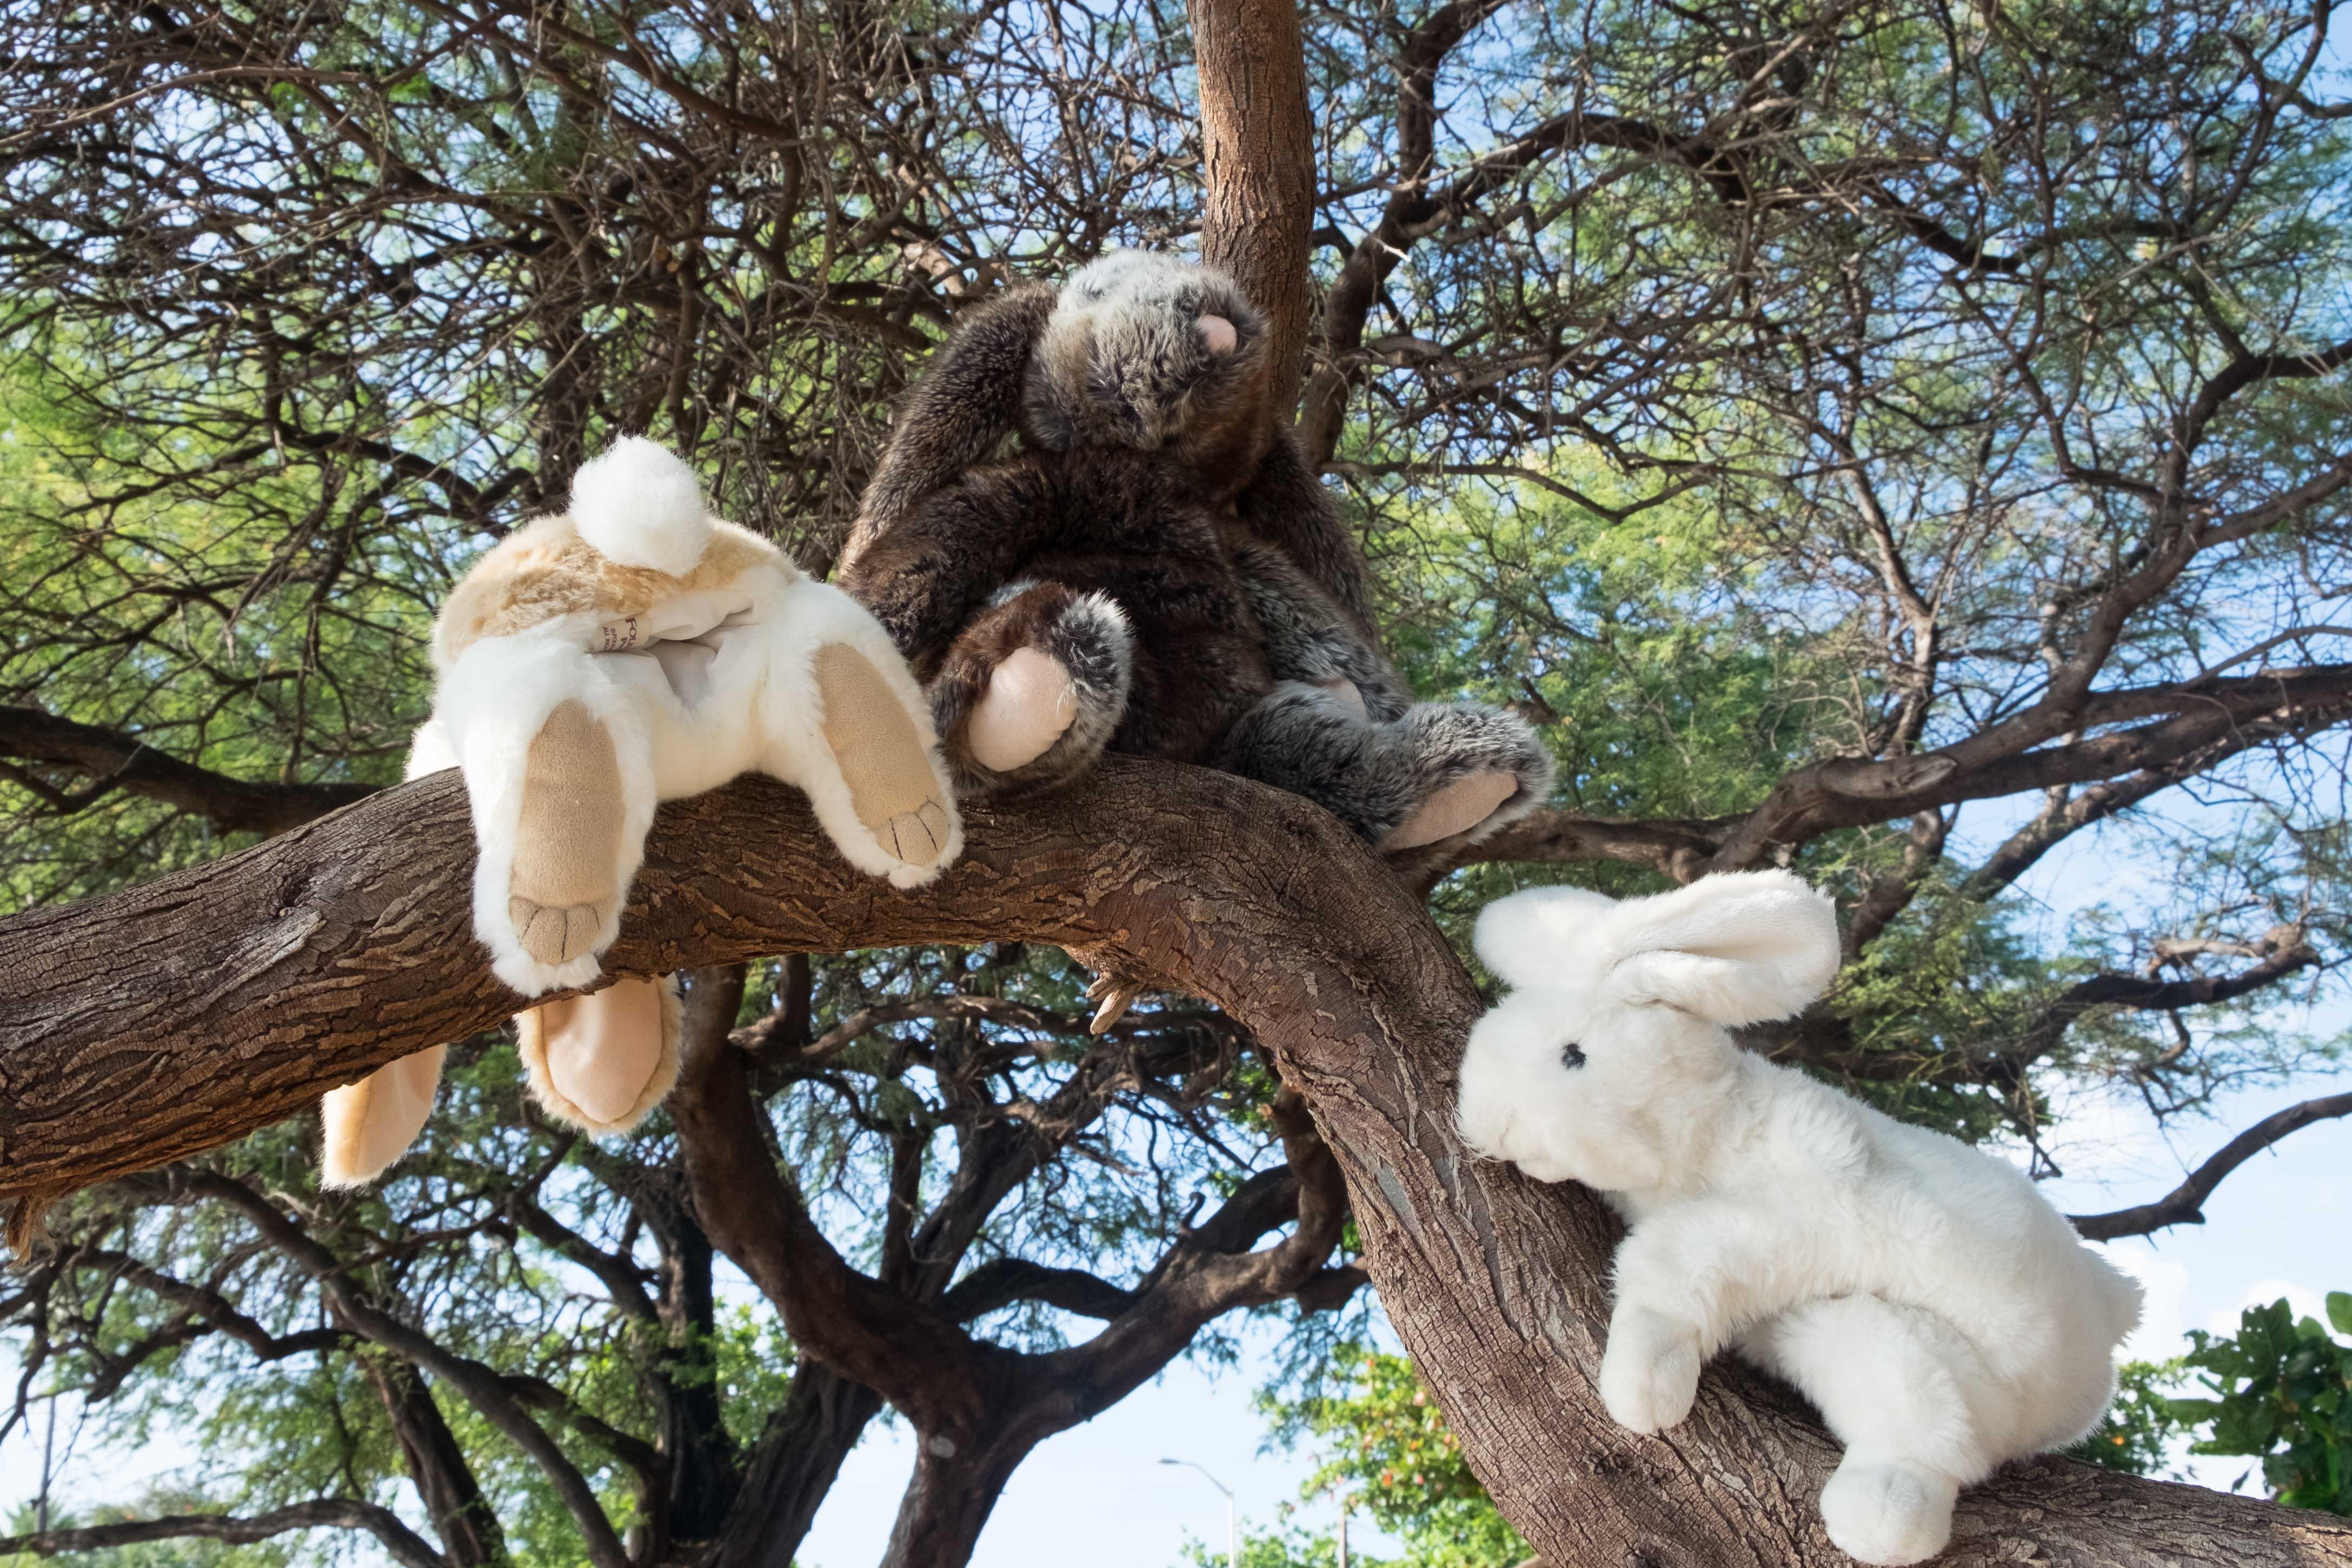 Stuffed bunnies climbing a tree